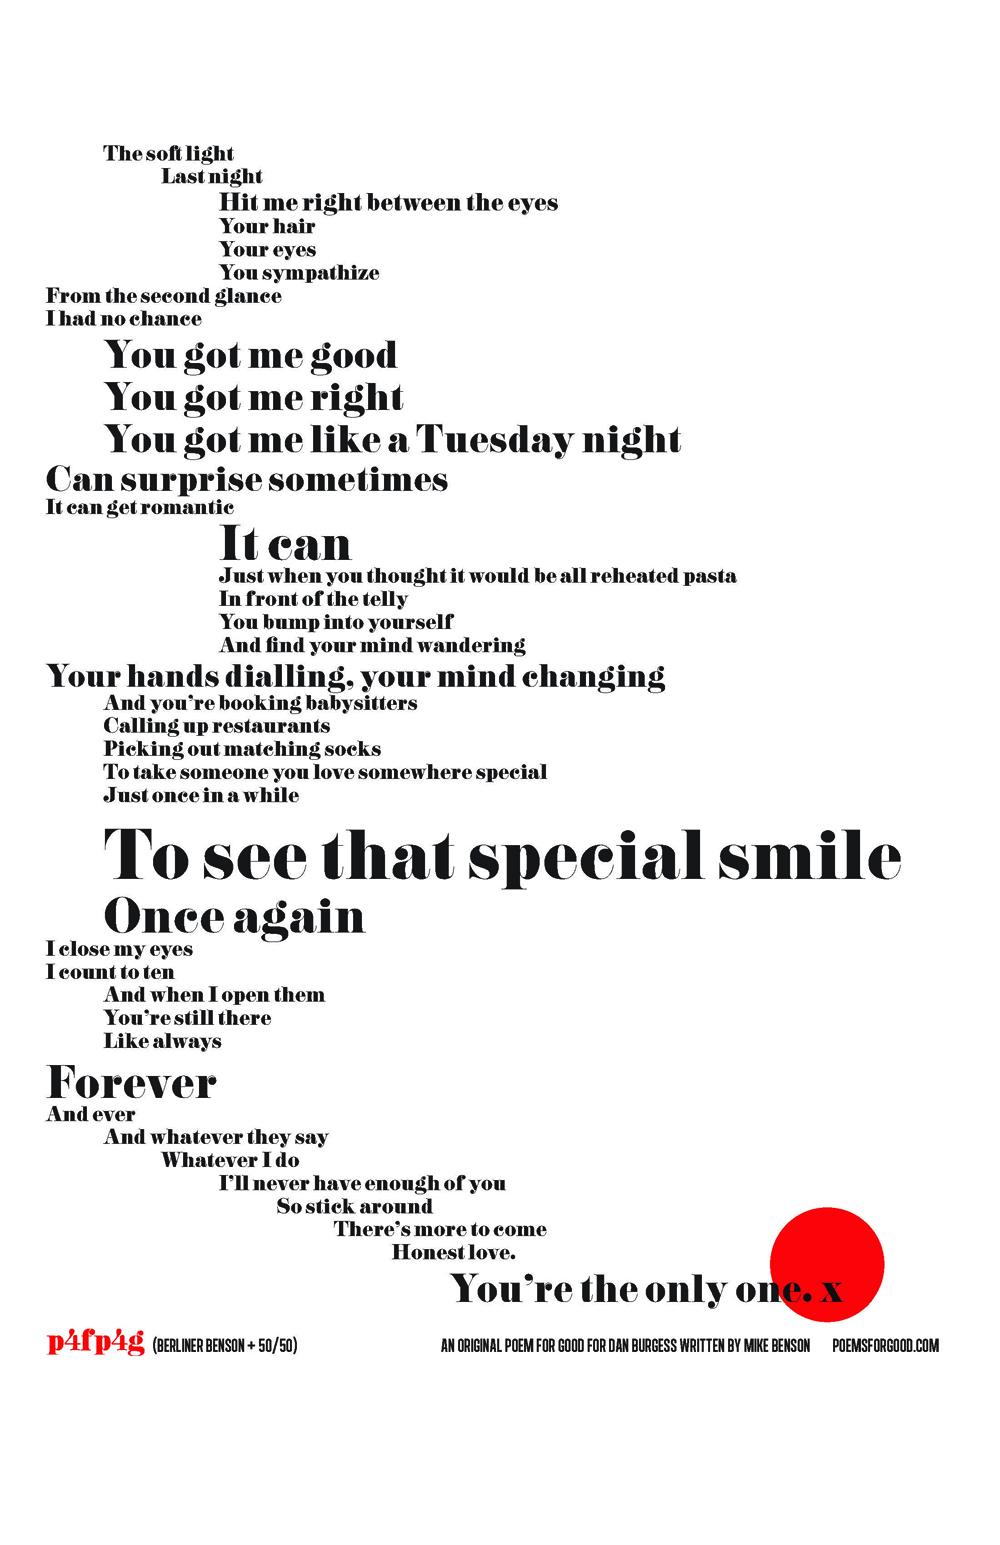 Poems for Good — BERLINER BENSON Creative Shop Practical